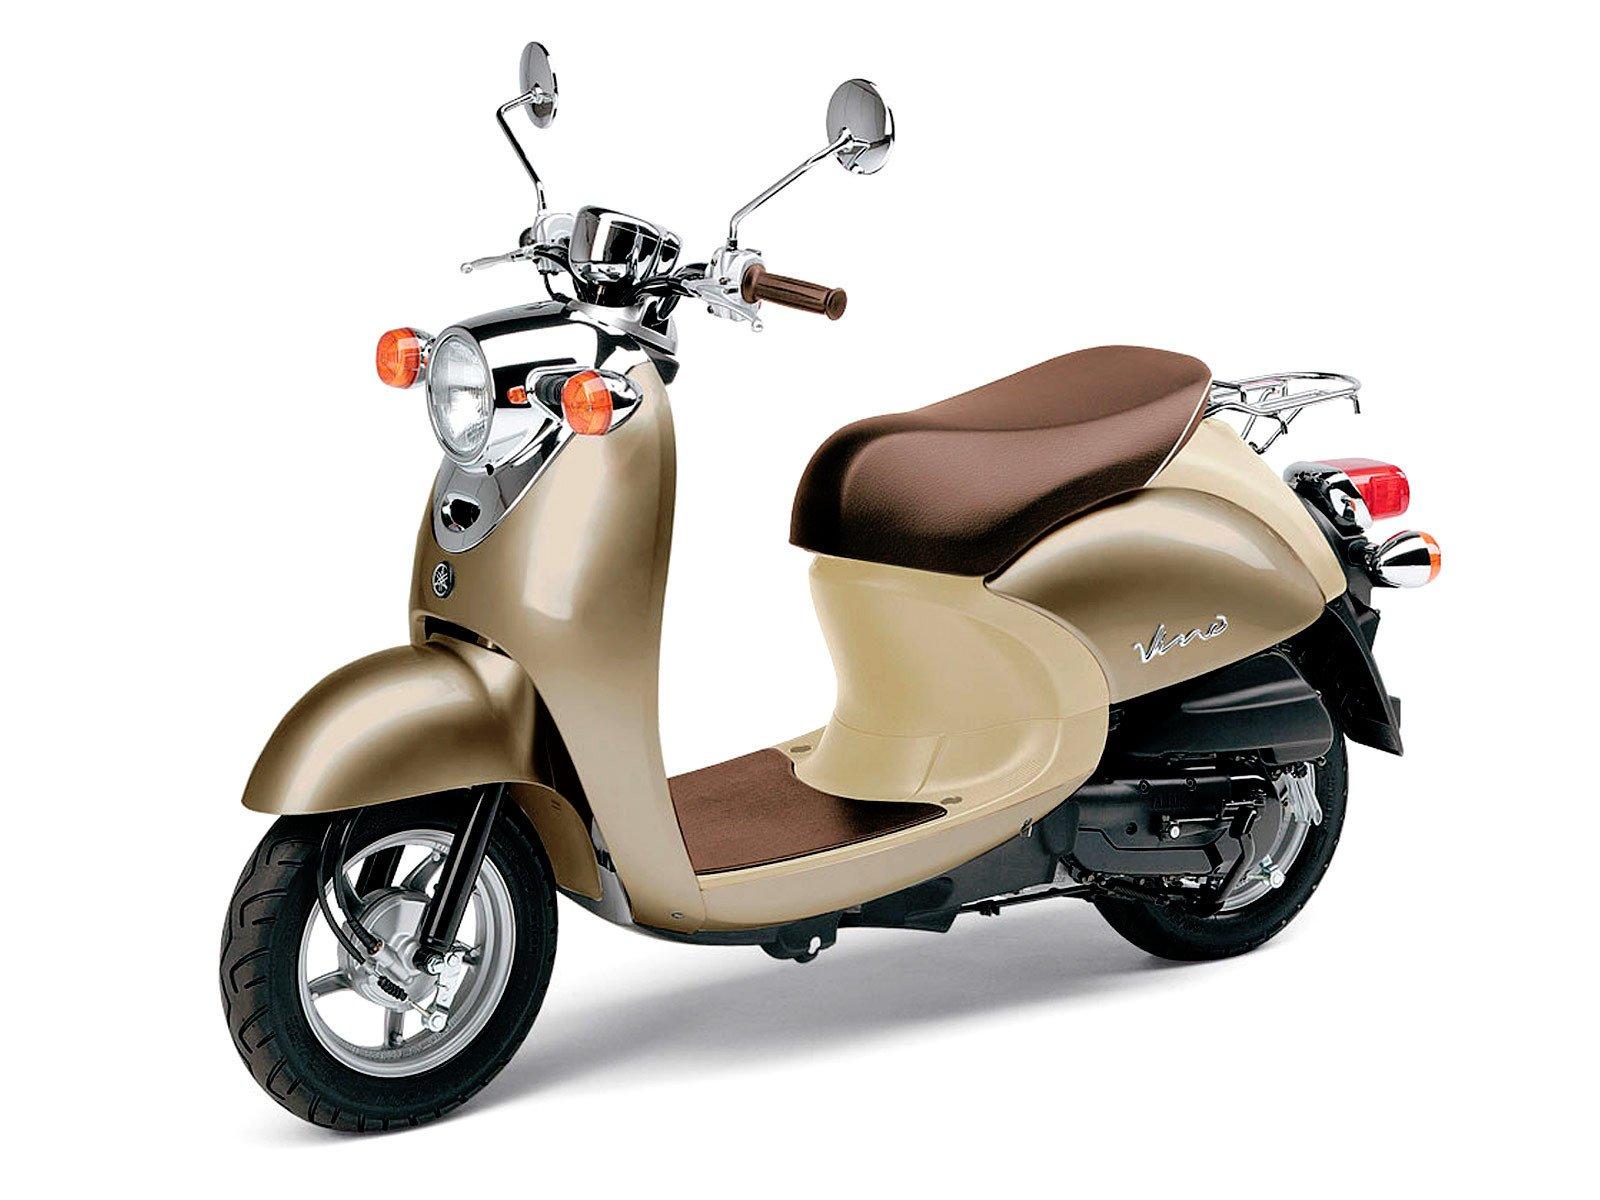 2010 Yamaha Vino 50 Classic Motorcycle Service Manual Auto R6 Wiring Diagram Pdf Gallery